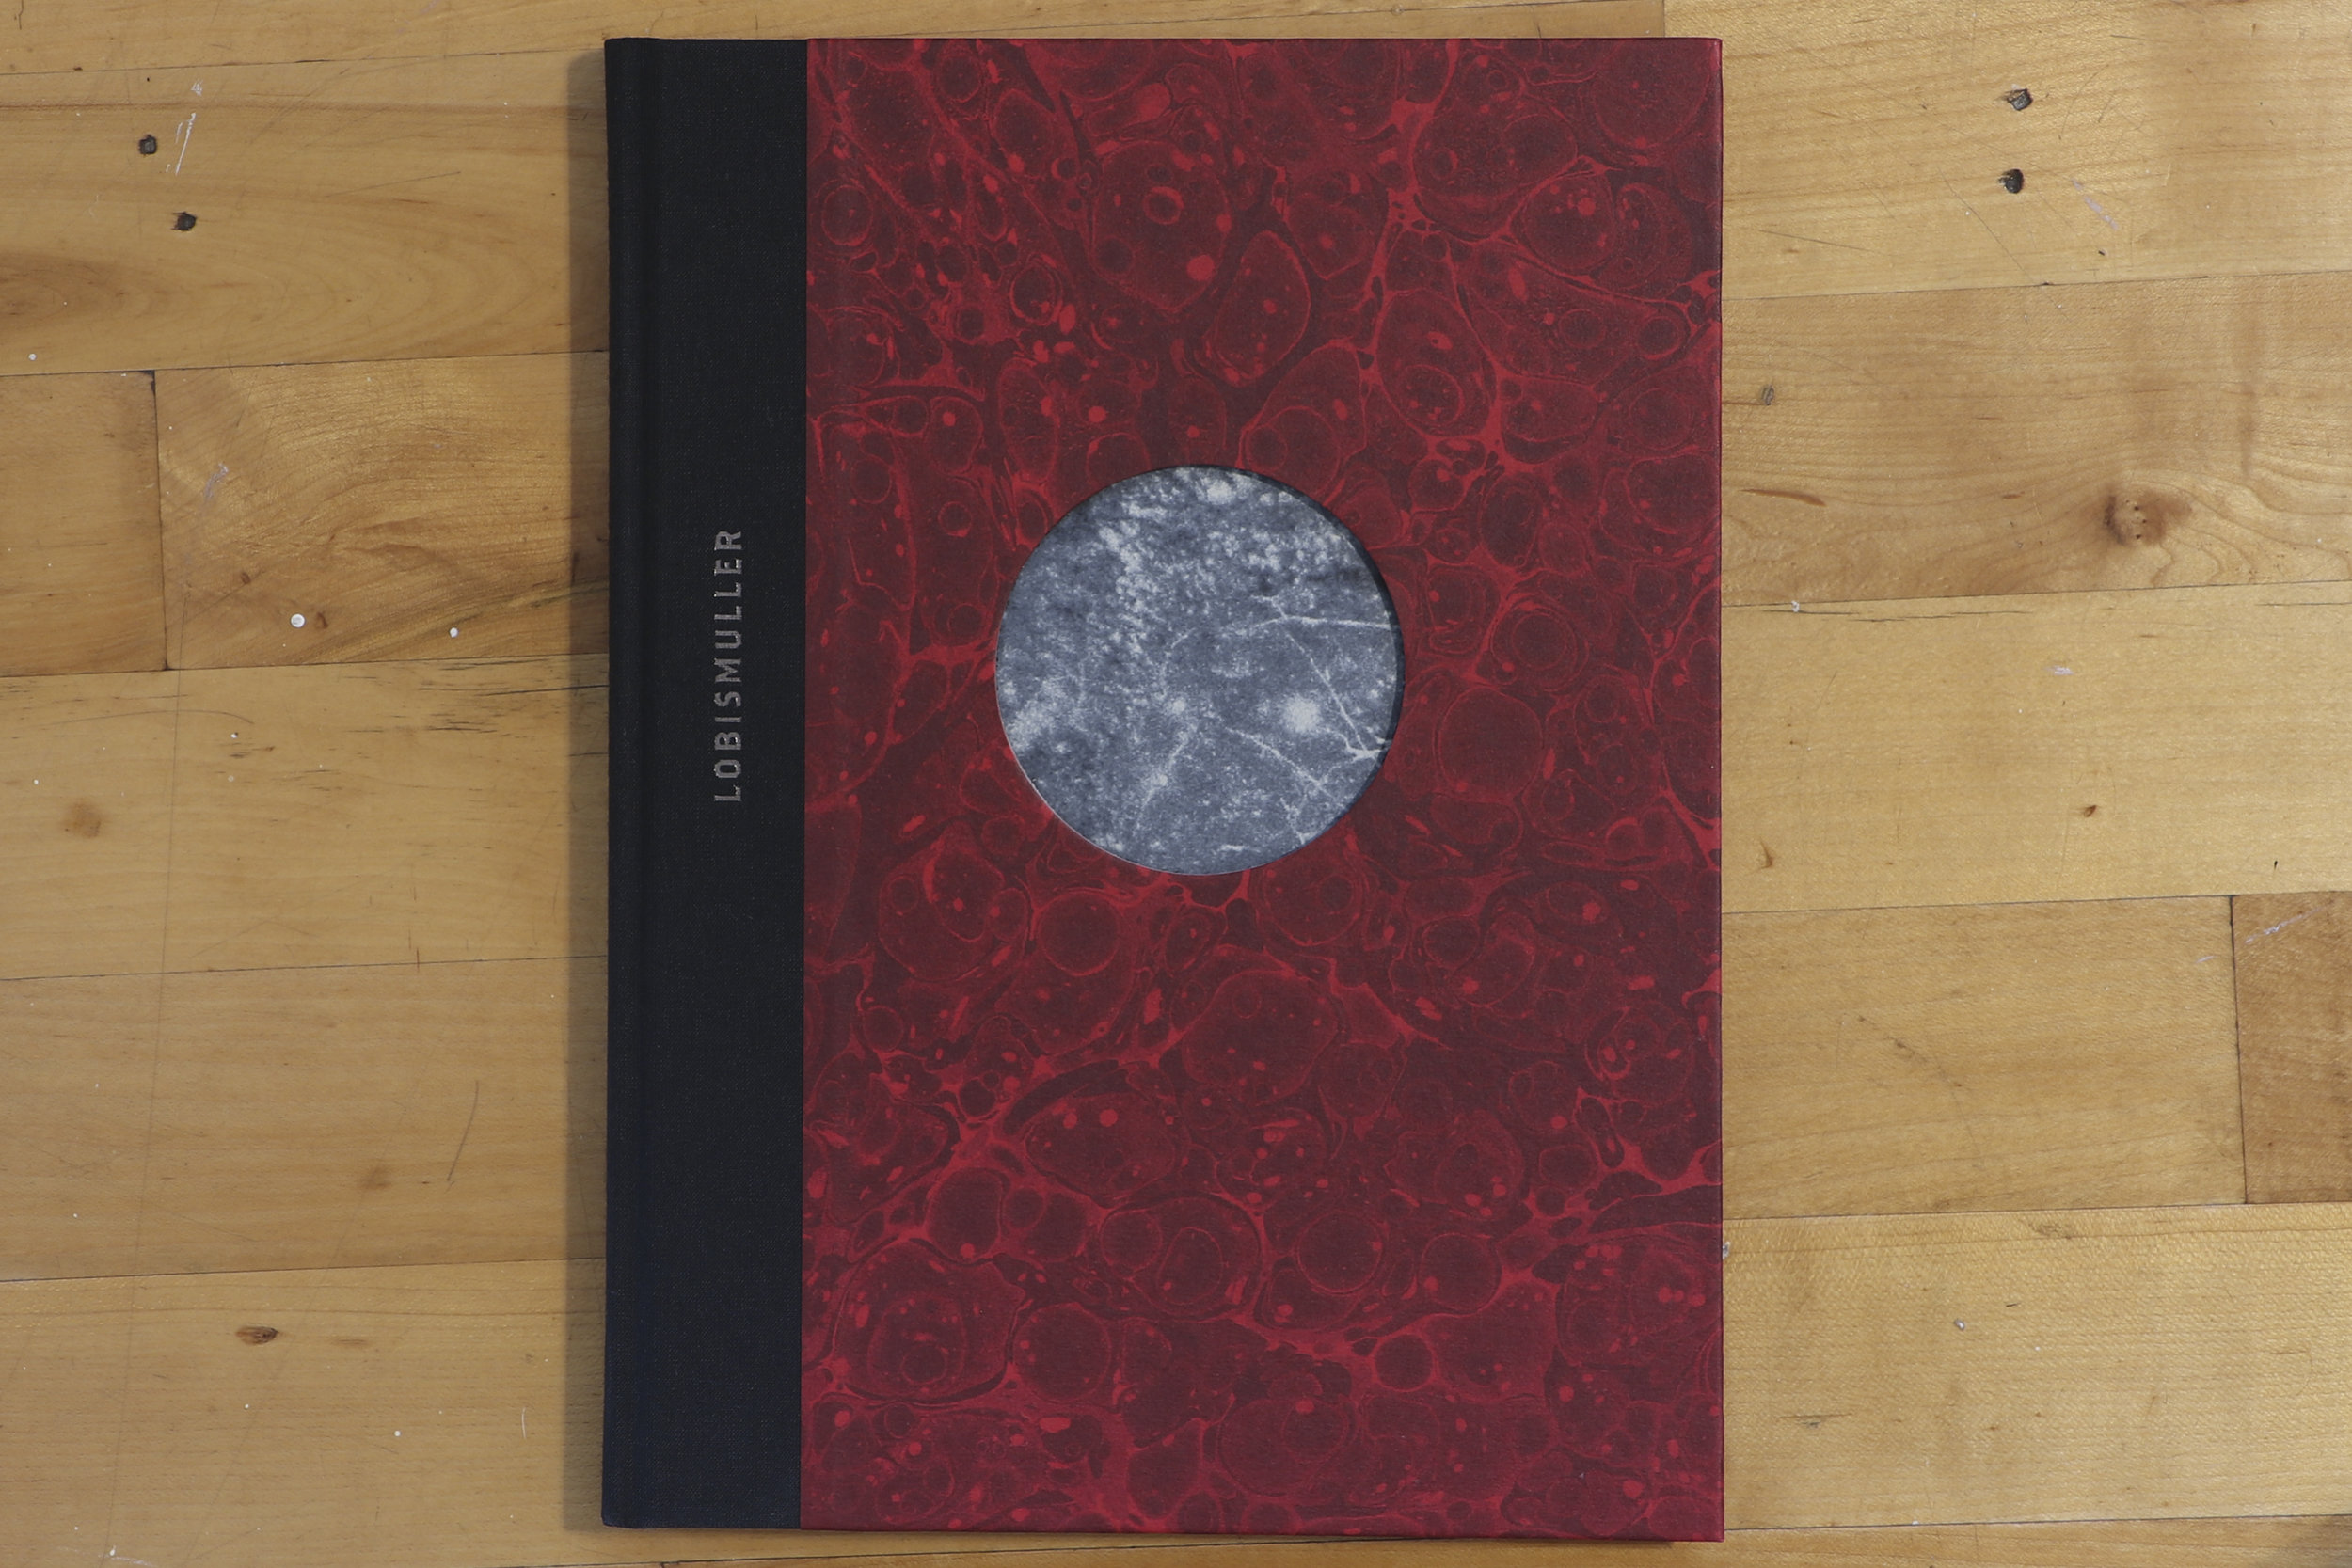 lobis front cover.jpg